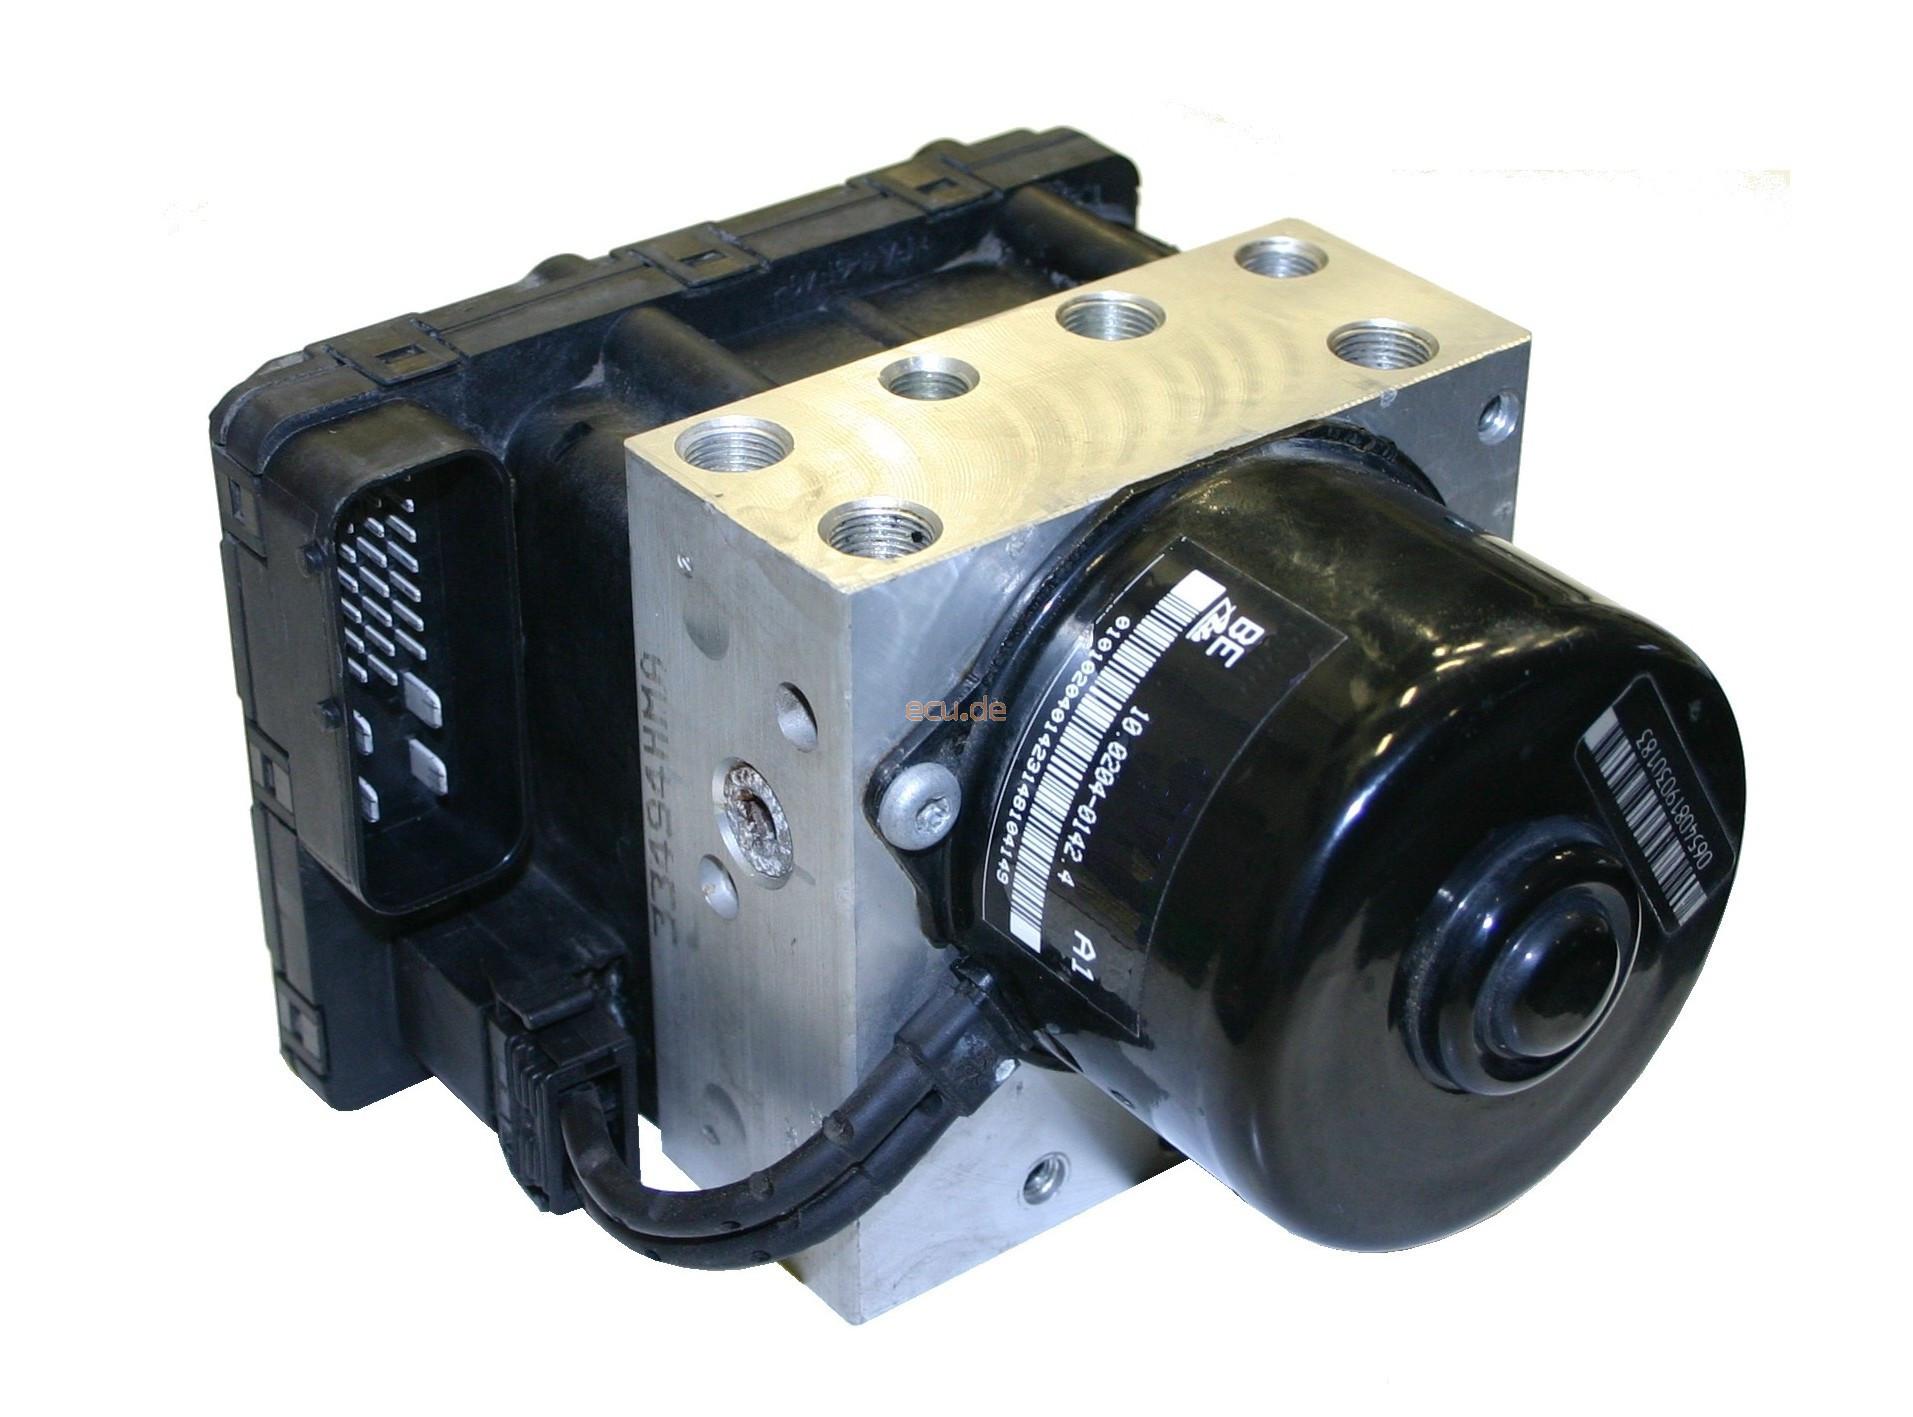 ABS-ESC Control Unit repair